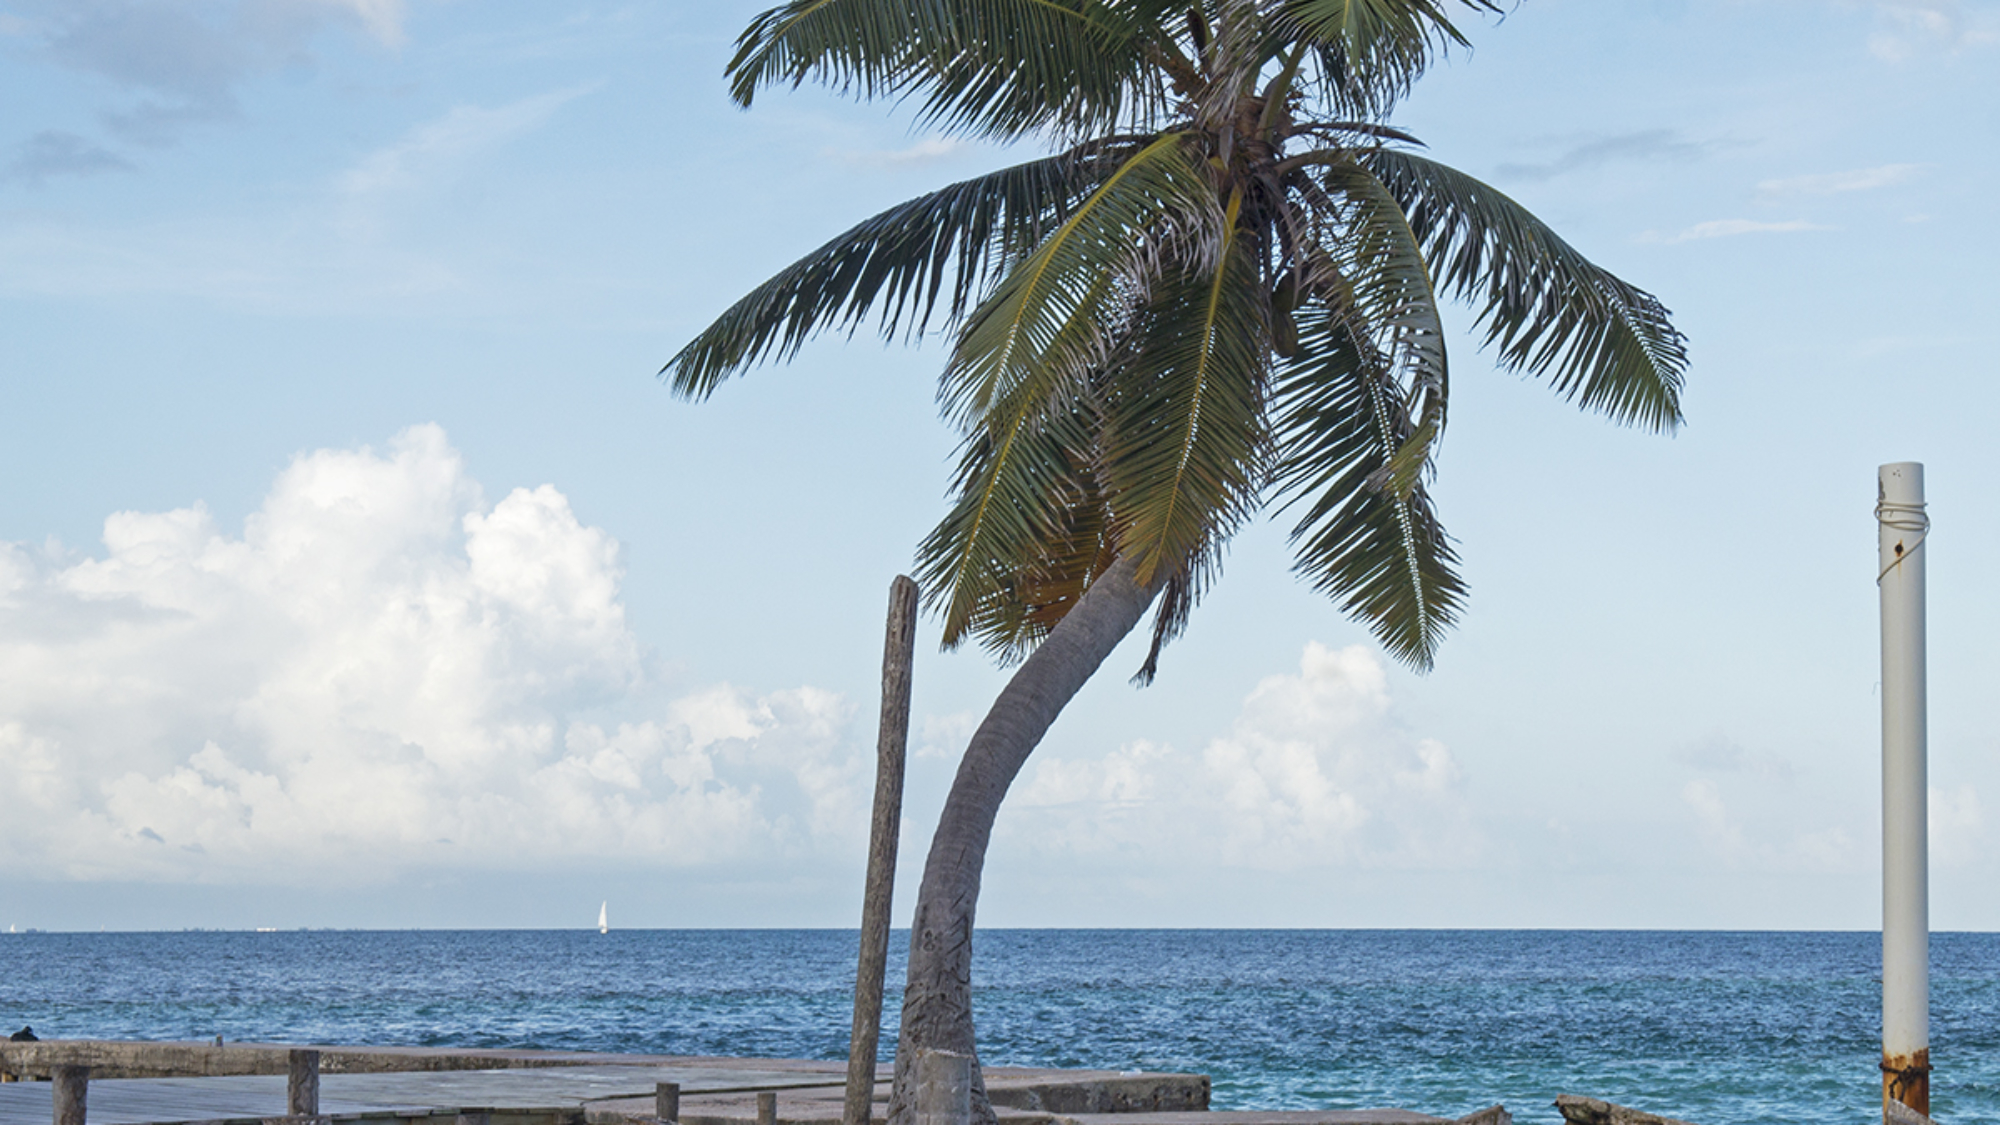 palm tree at Cay Caulker